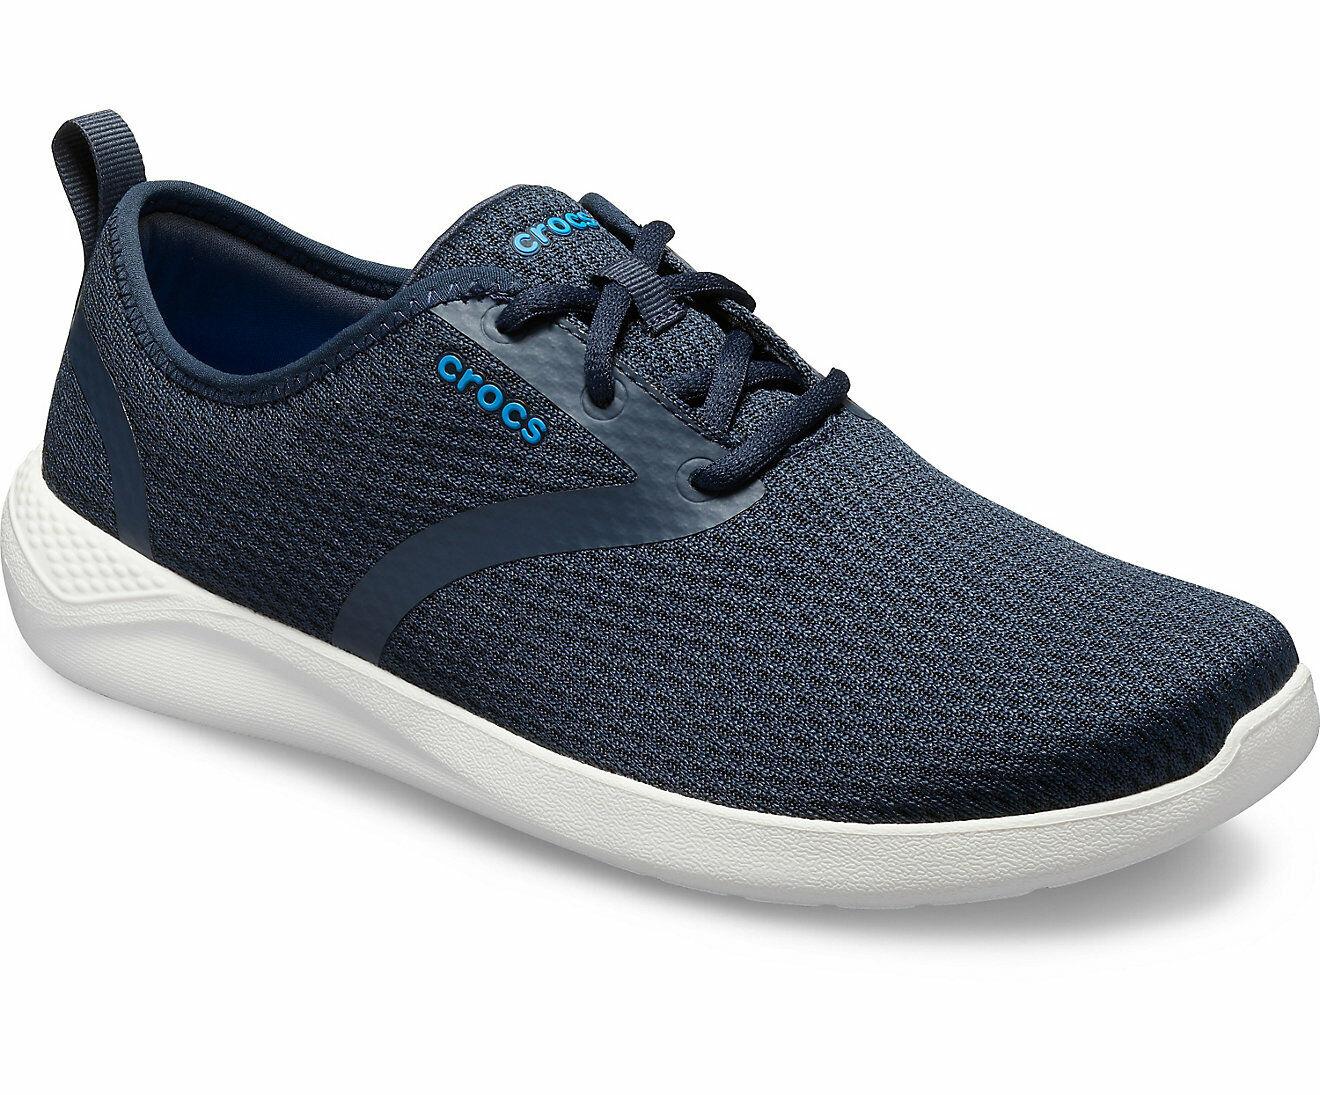 Crocs LiteRide Mesh Lace Men's Sneakers - 205678  New!